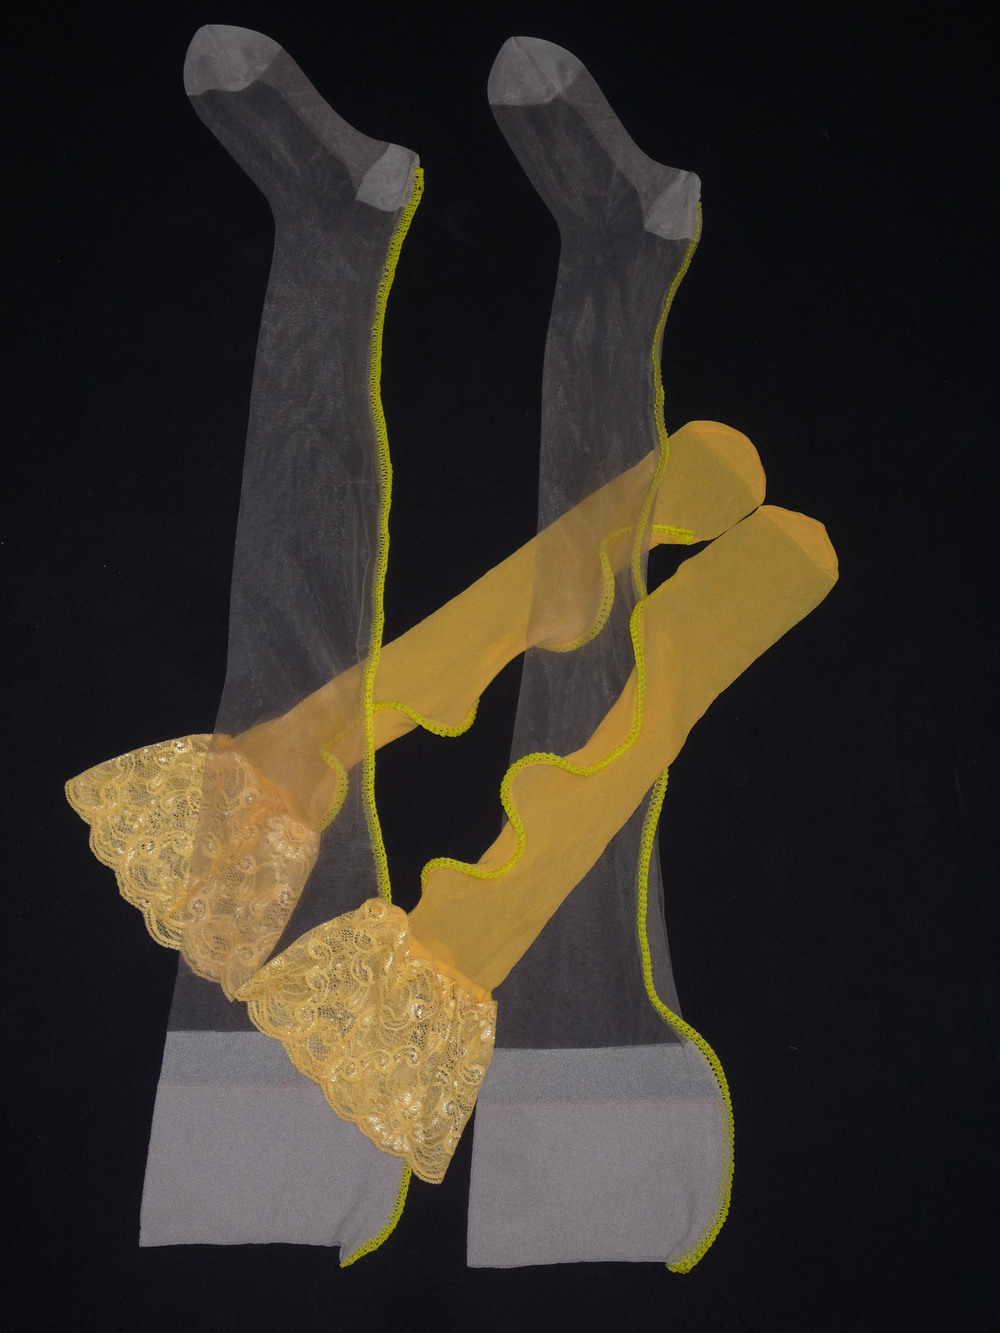 Fotografie, Digital Print auf Bütten, 29x20 cm, Nr.4